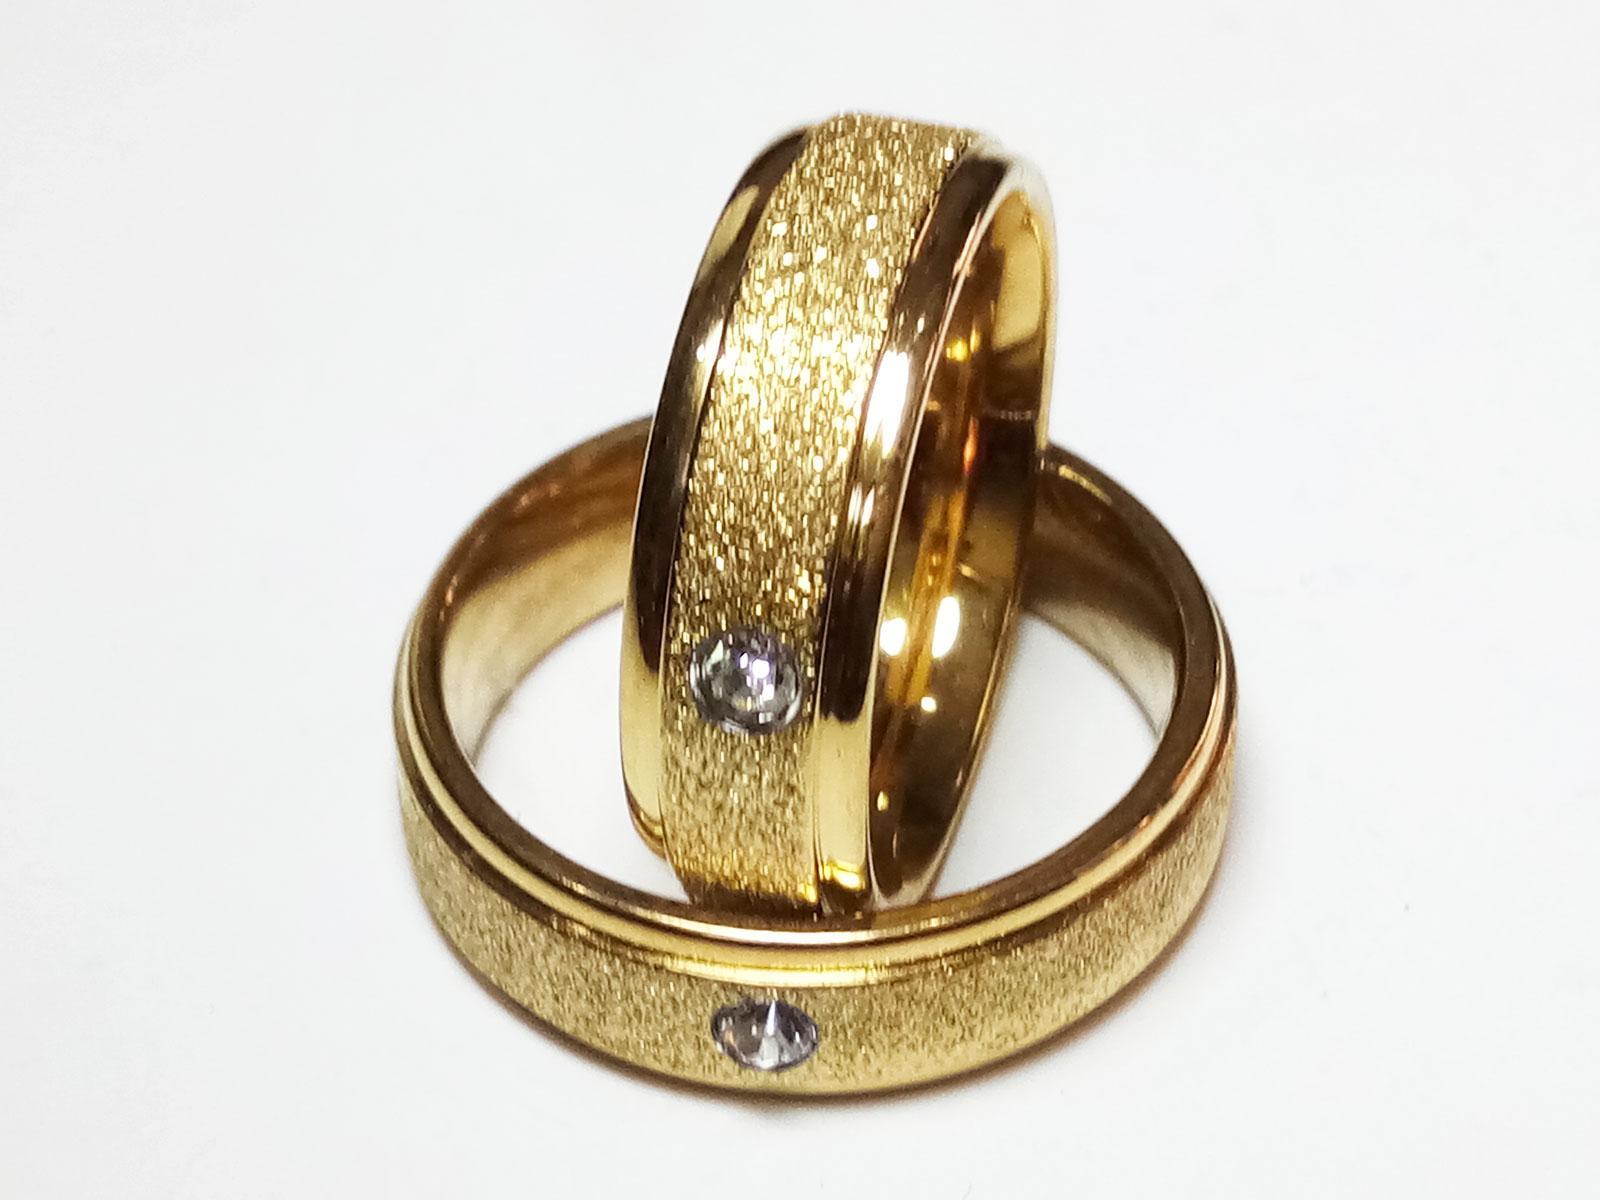 VeE Cincin Single / Couple / Pasangan untuk Tunangan / Nikahan Titanium Stainless Steel Gold Pasir M2